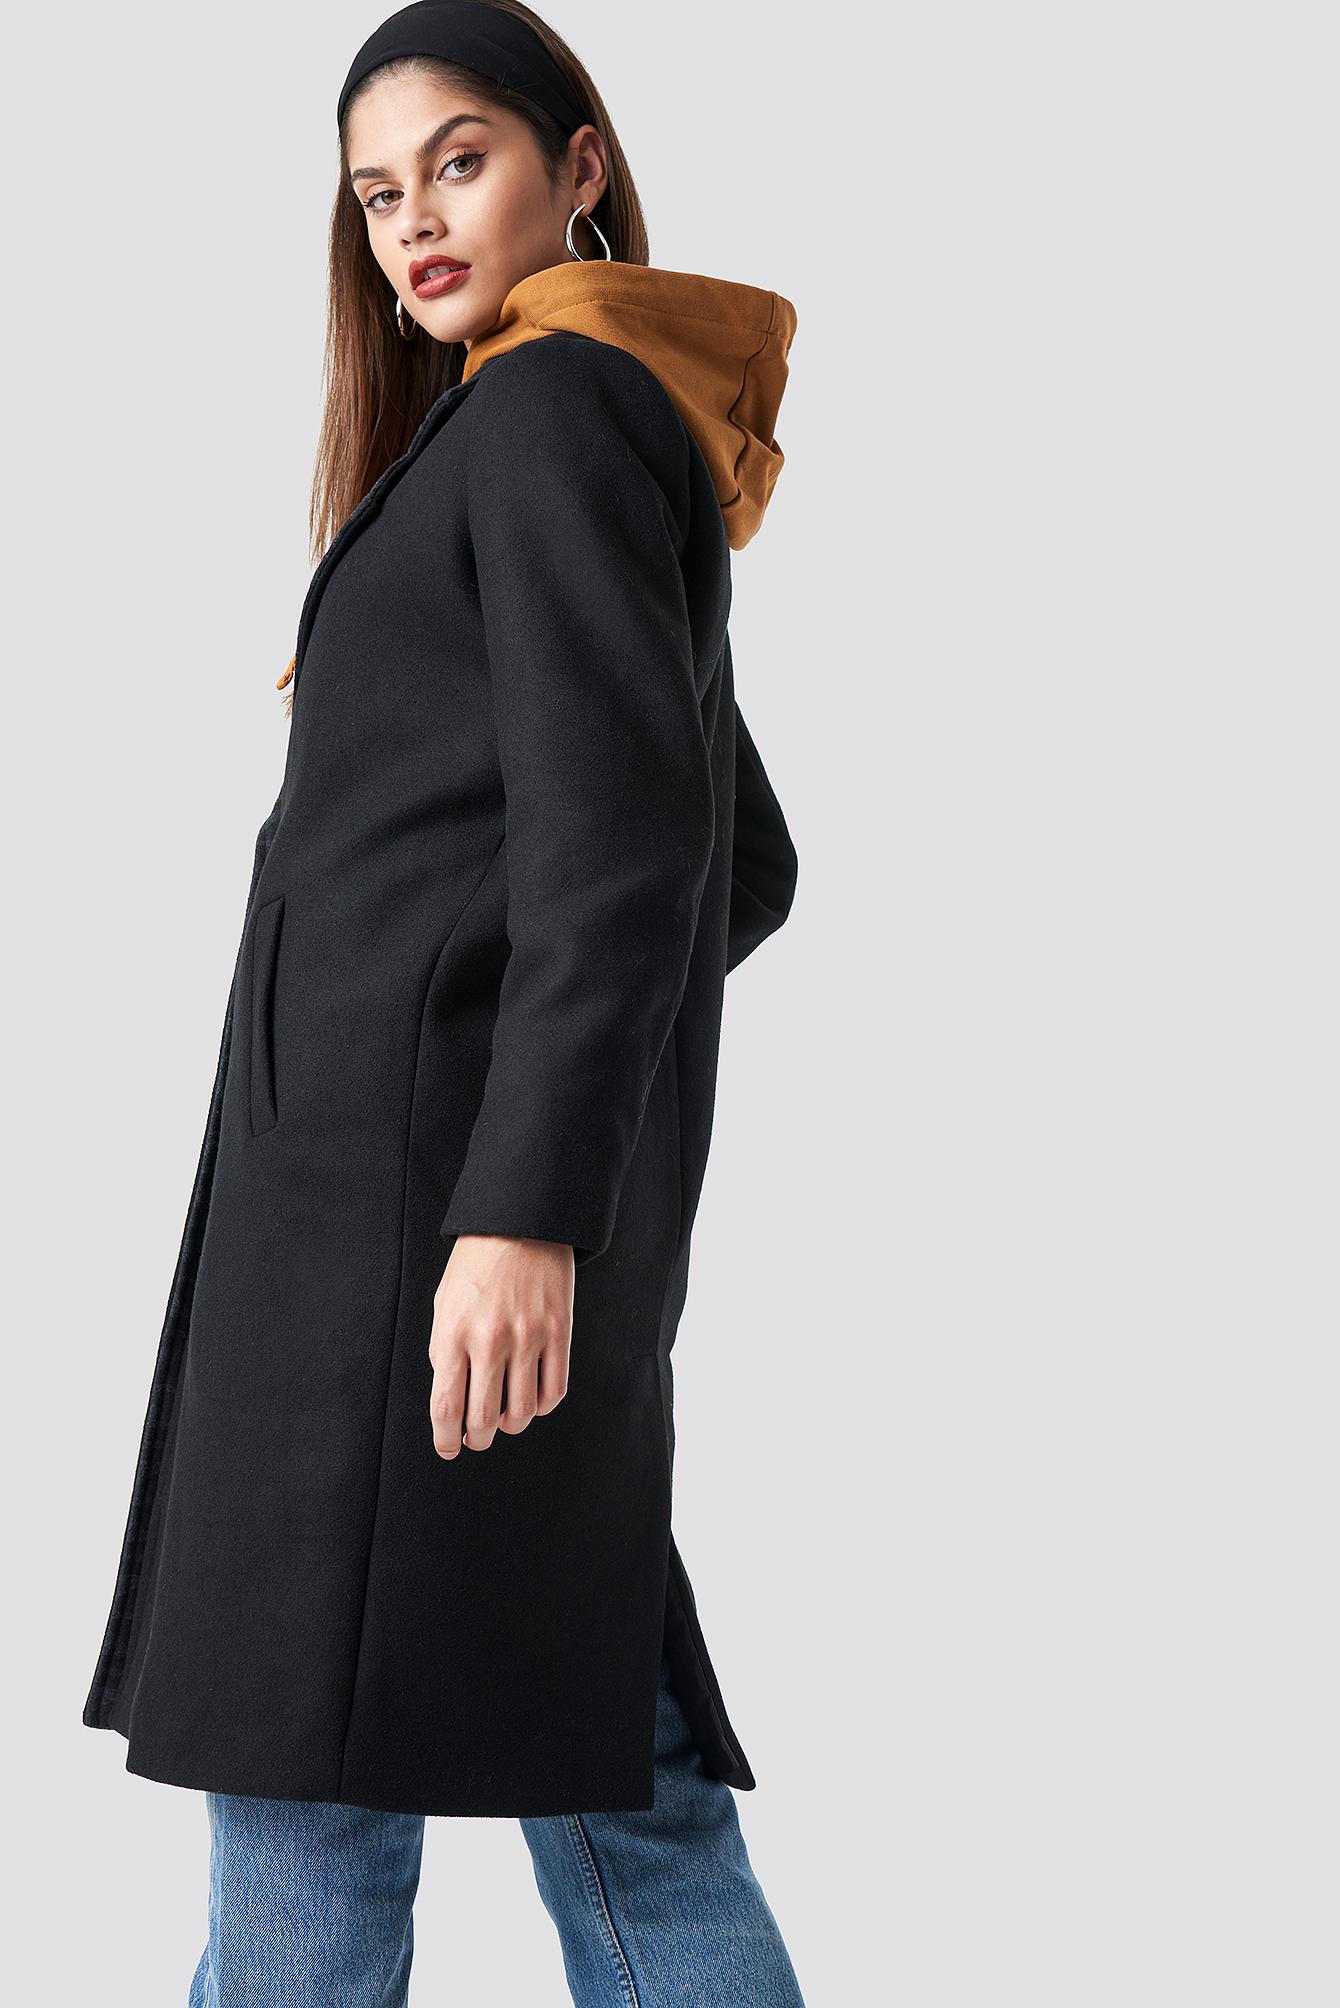 N Branded Lapel Coat NA-KD.COM